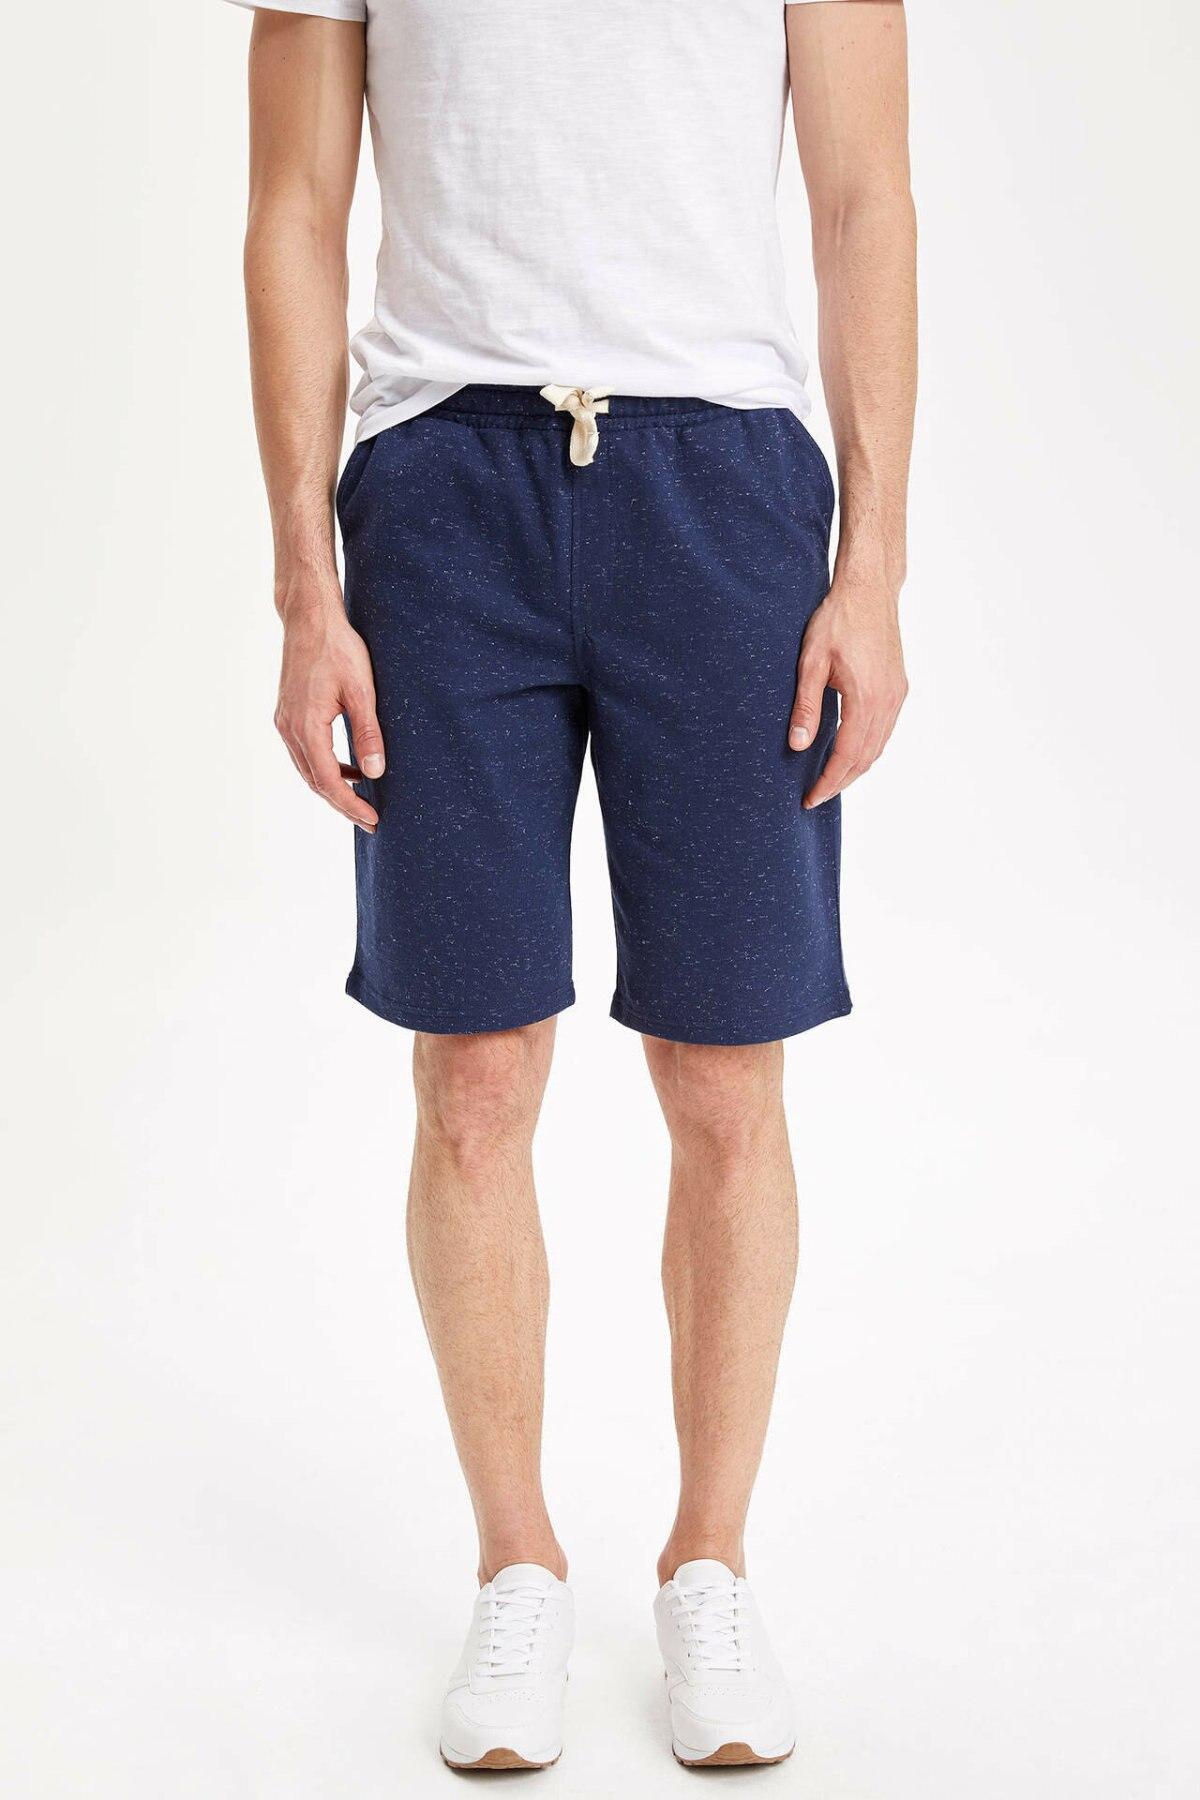 DeFacto Man Summer Solid Color Short Bottoms Men Casual Loose Lace-up Bottom Short Male Blue Shorts-L0071AZ19SM